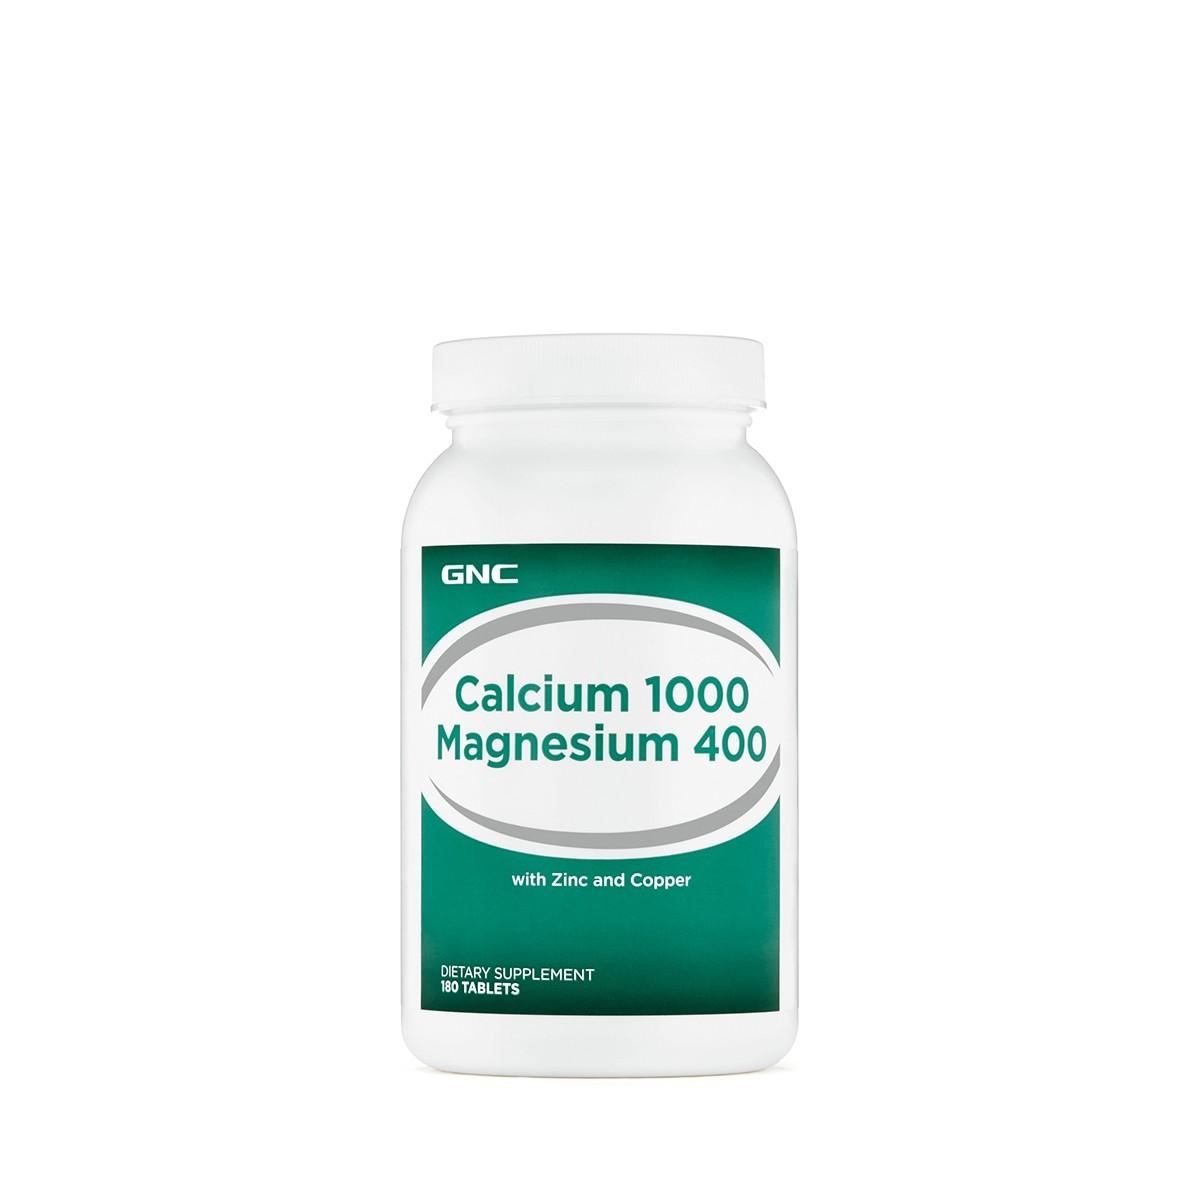 GNC Calciu 1000 mg Magneziu 400 mg, 180 tb